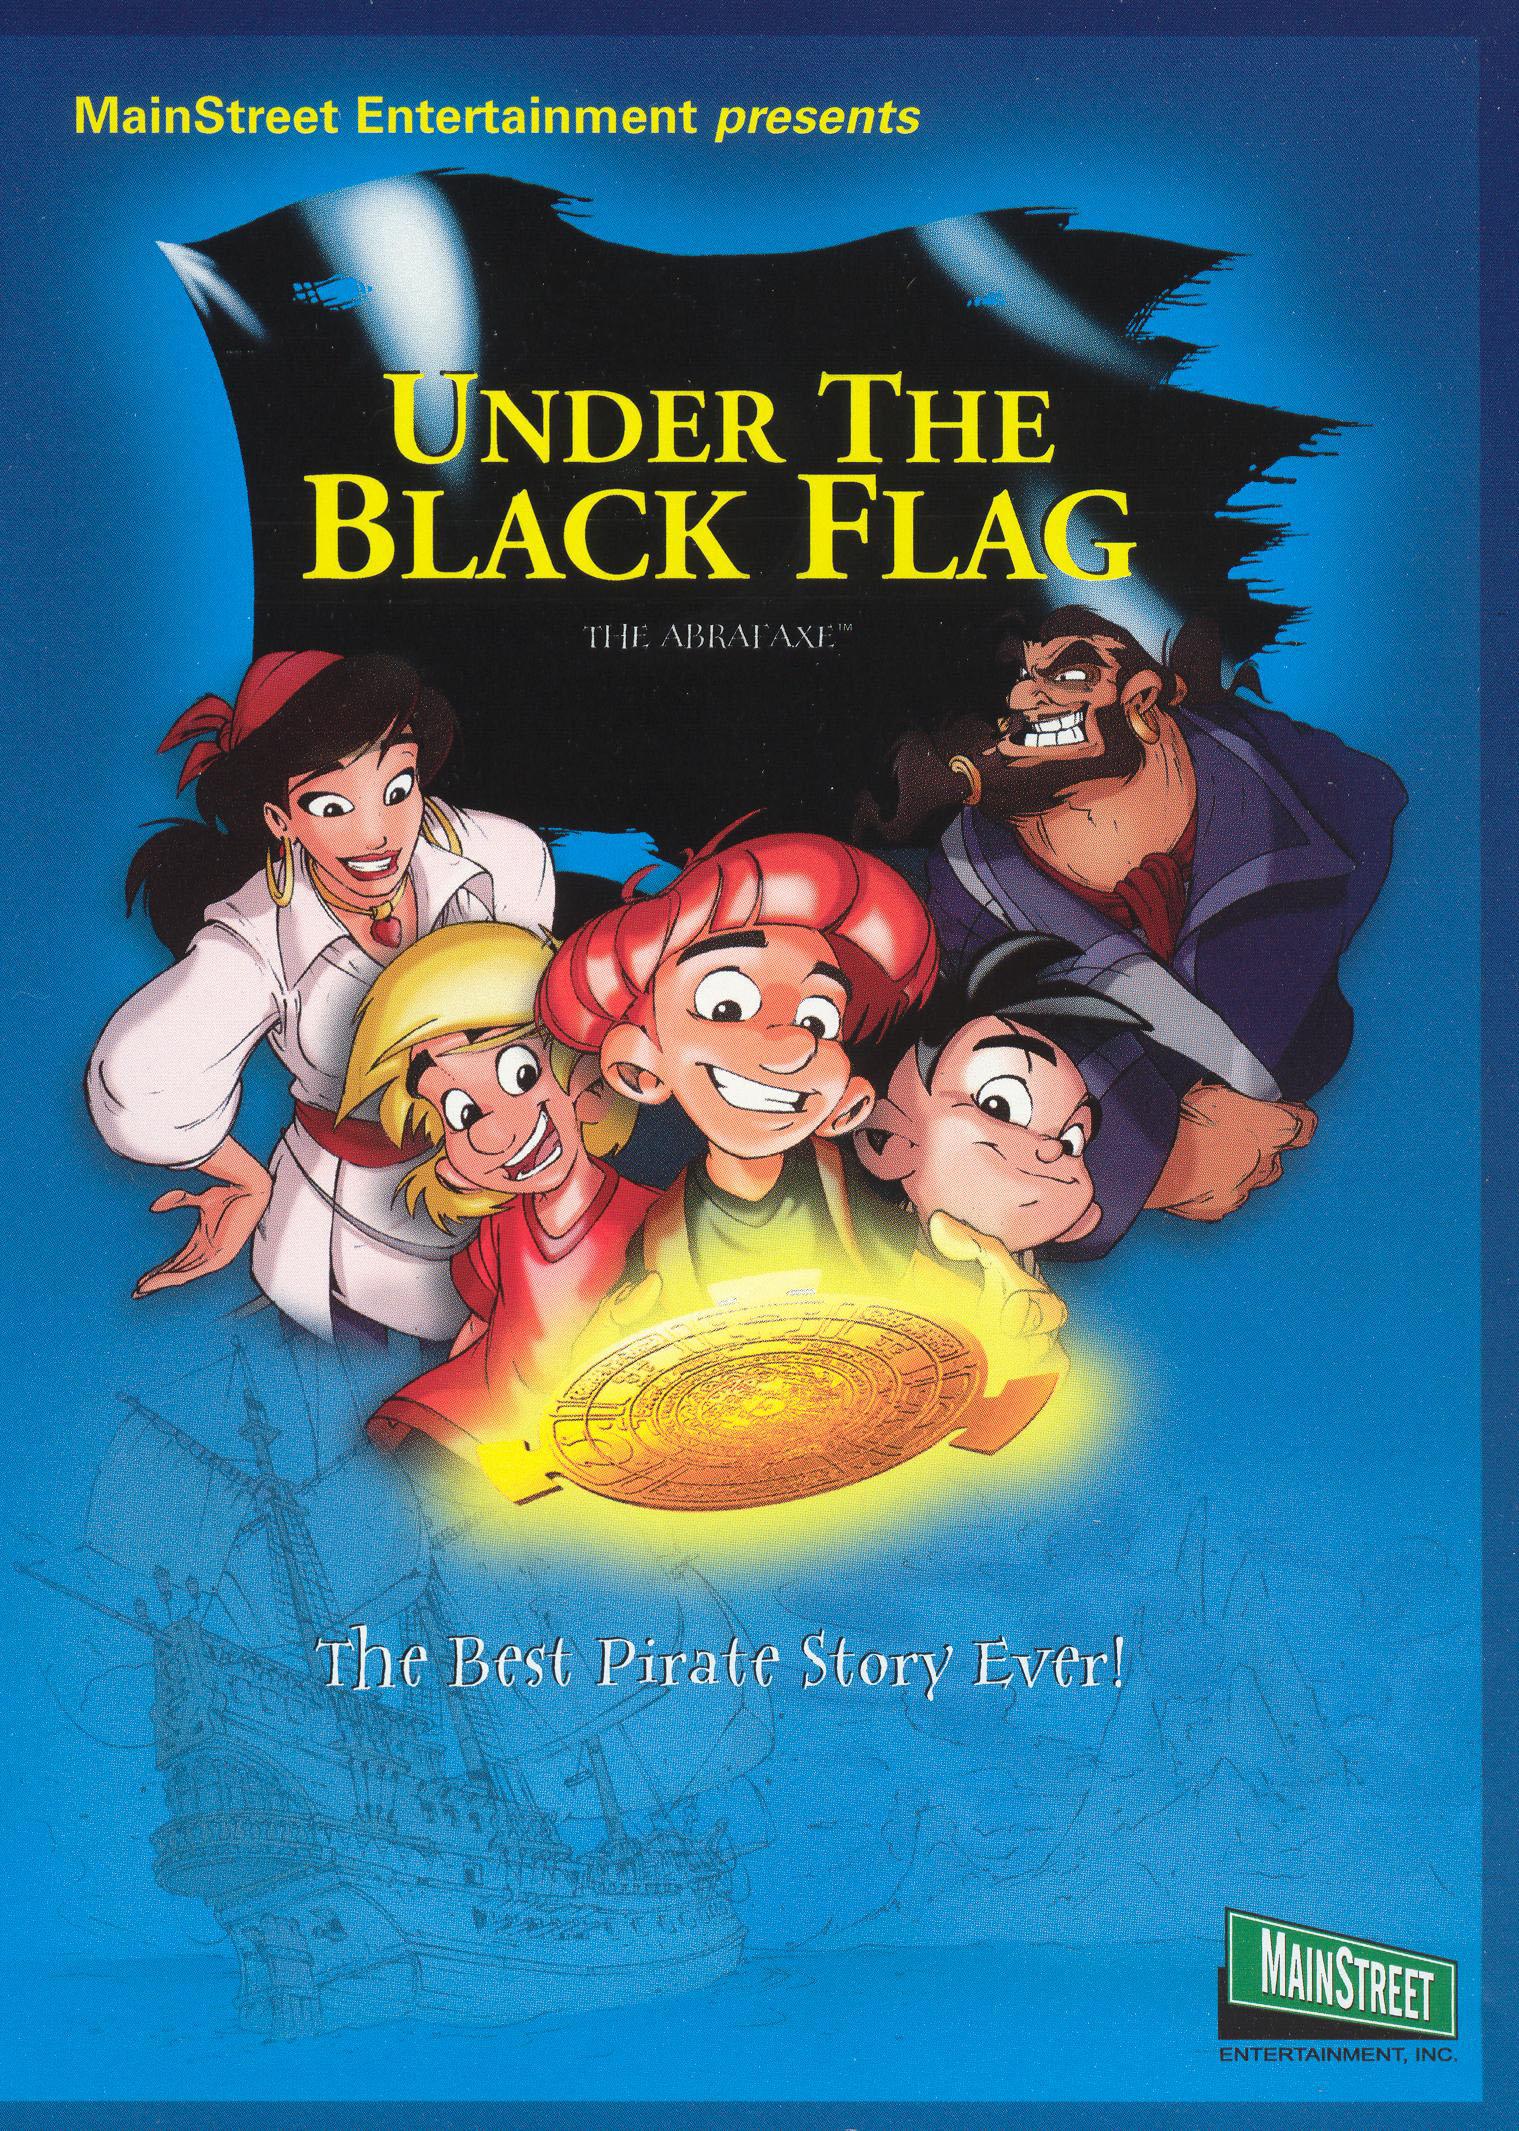 The Abrafaxe: Under the Black Flag